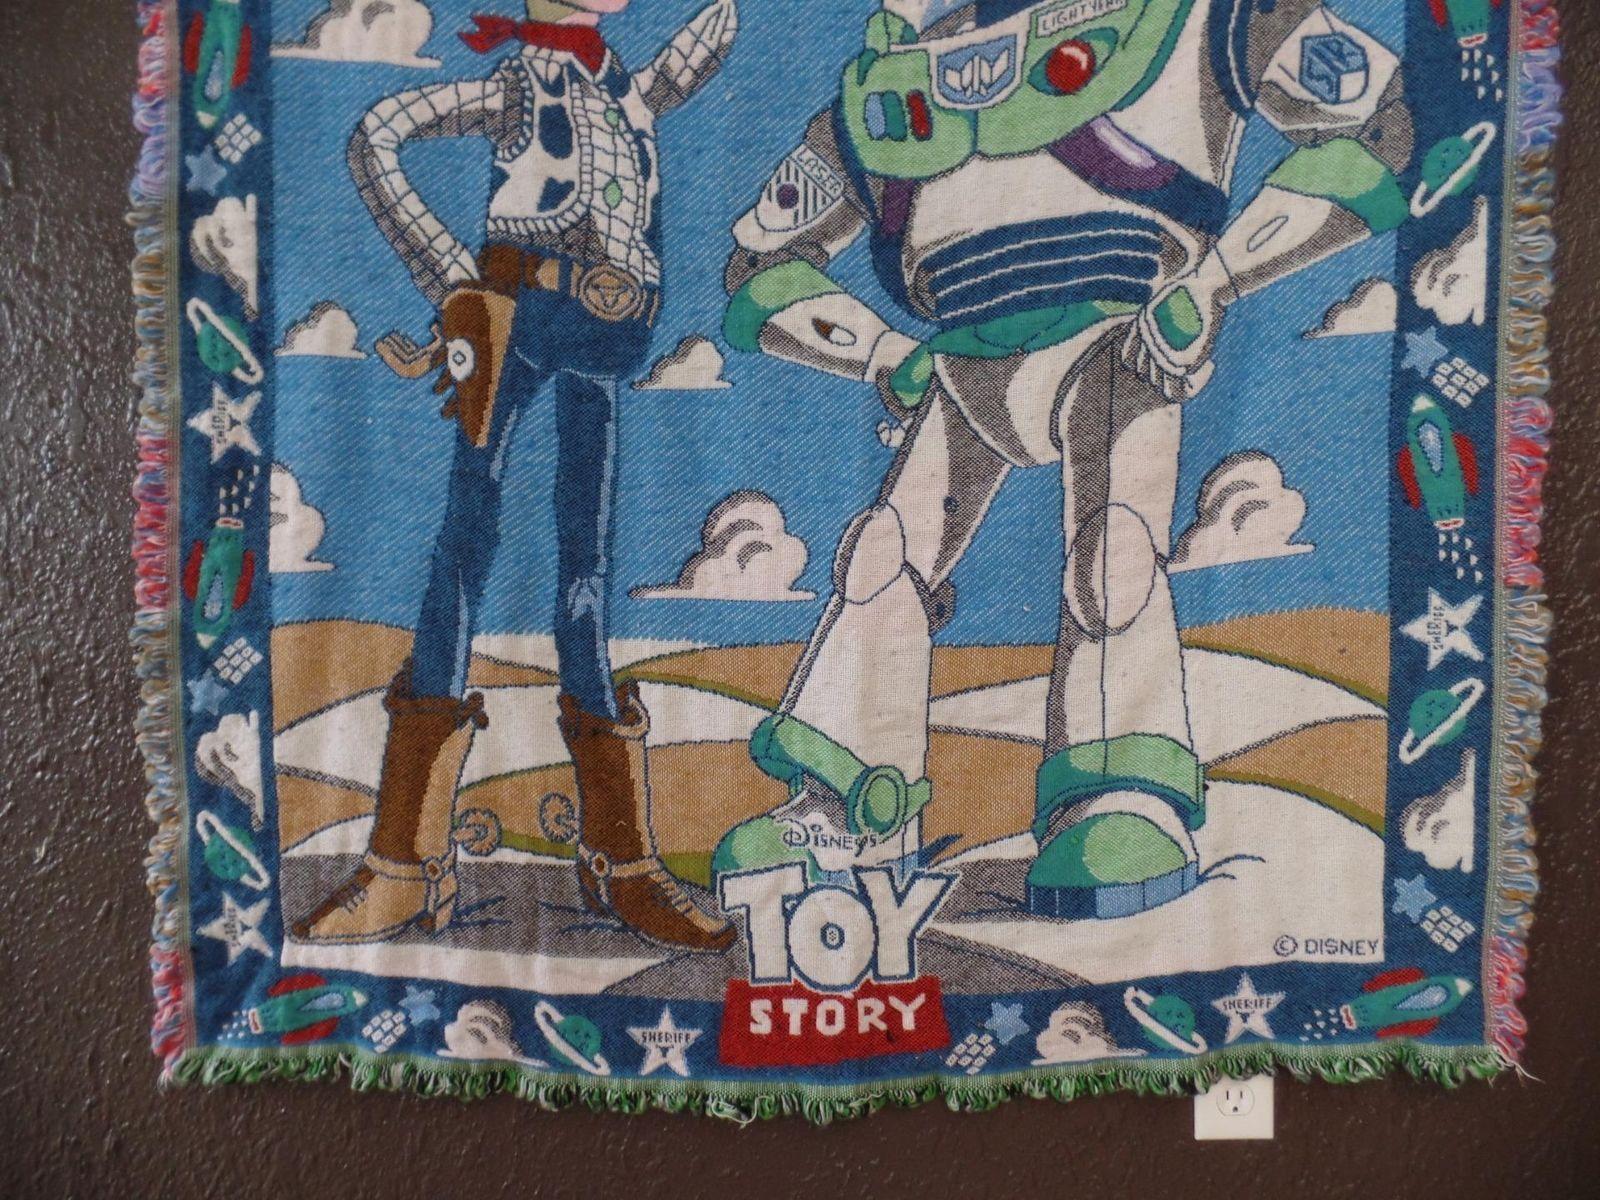 Disney Toy Story Blanket 56x48 Woody Buzz Lightyear Woven